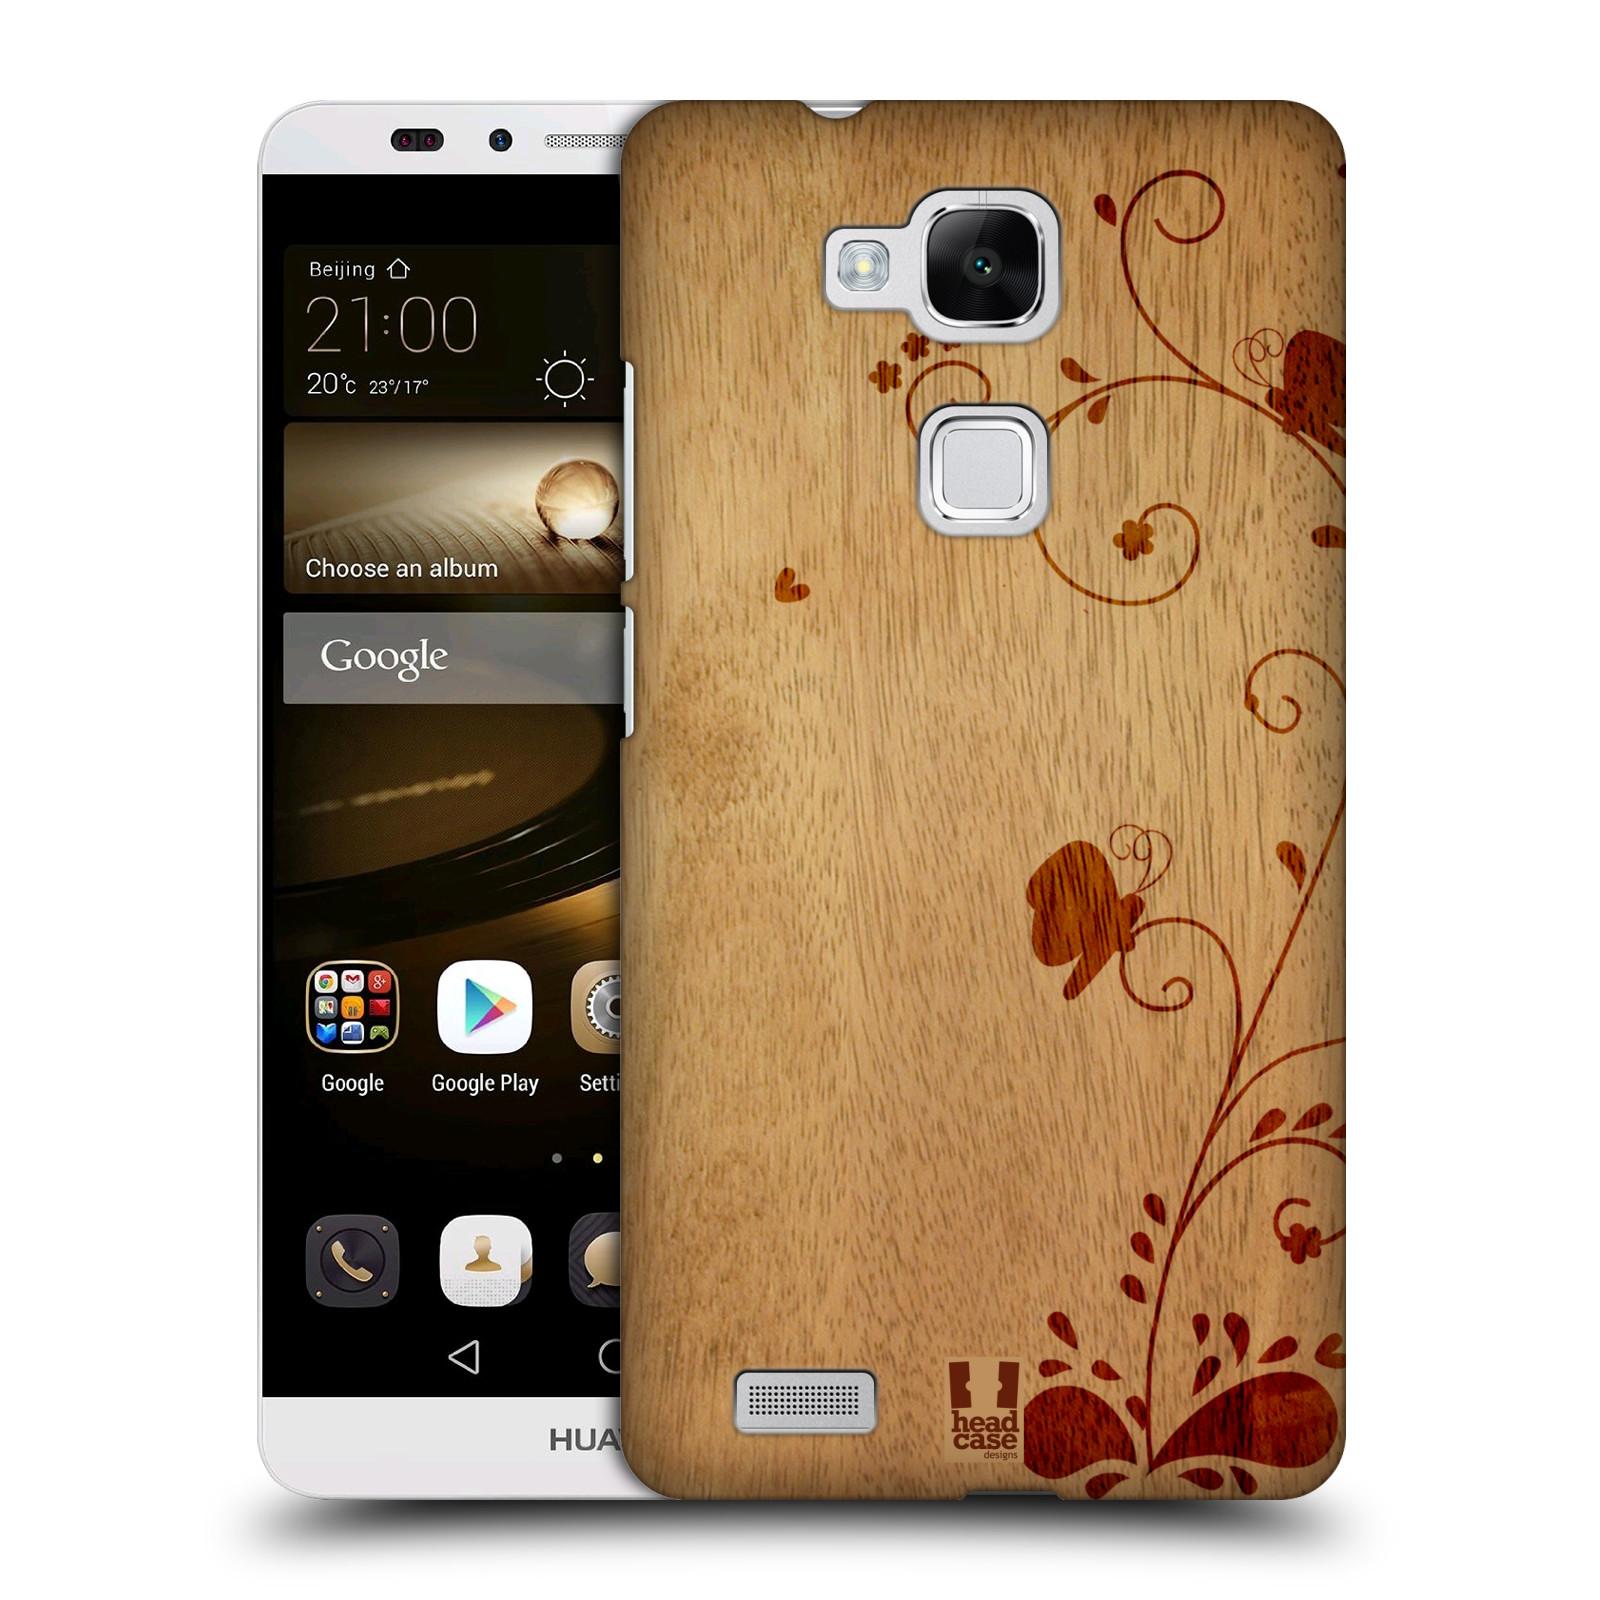 Plastové pouzdro na mobil Huawei Ascend Mate 7 HEAD CASE WOODART SWIRL (Kryt či obal na mobilní telefon Huawei Ascend Mate7)